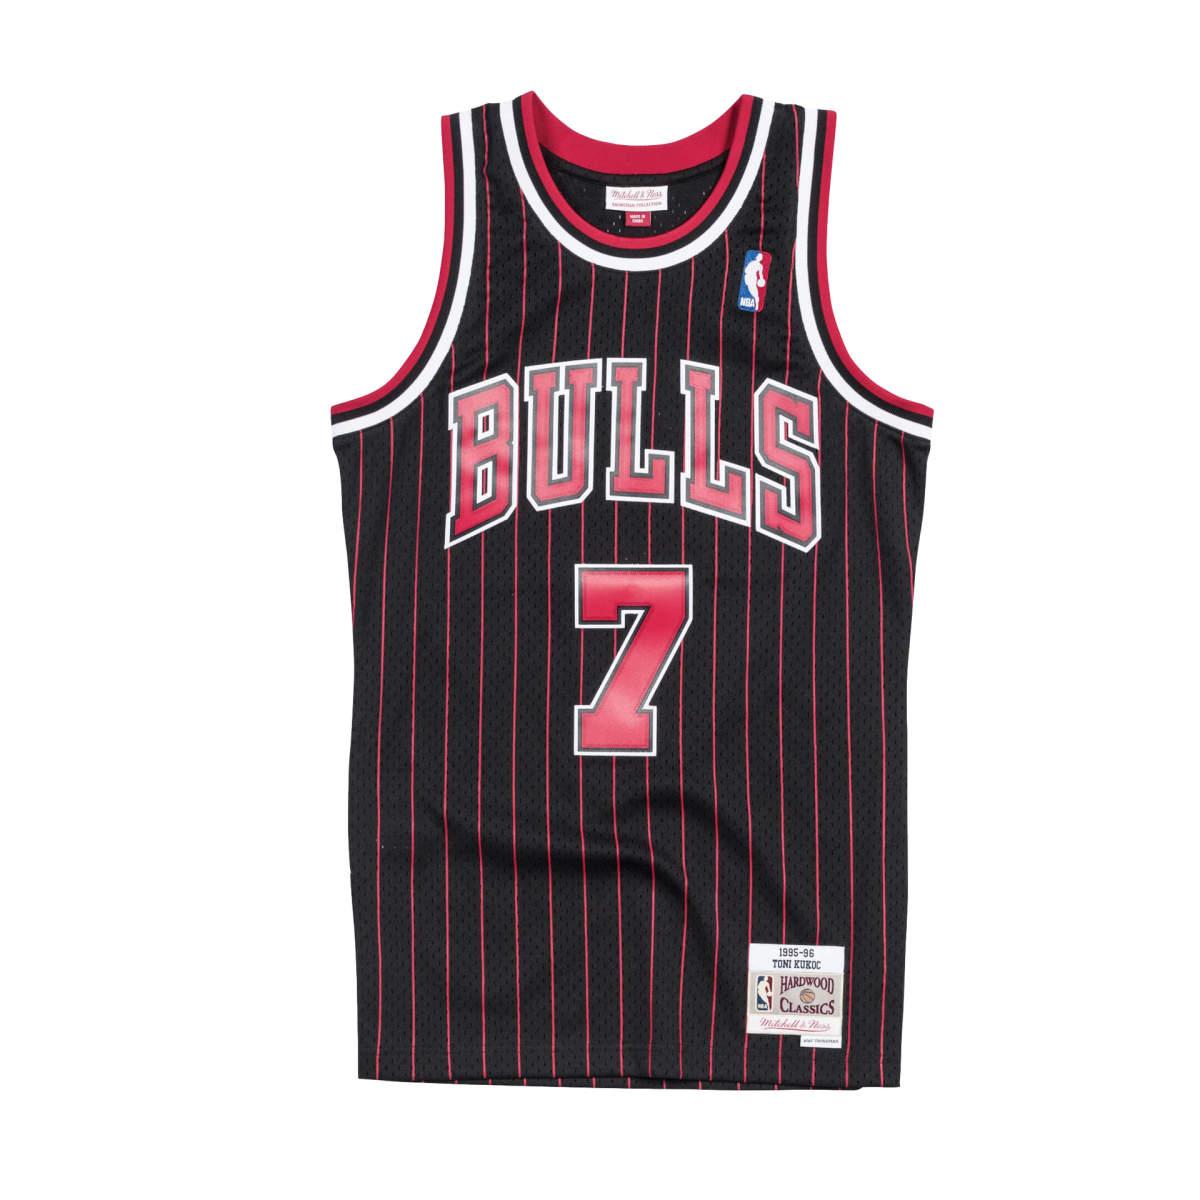 Chicago bulls alternate swingman jersey 1995-96 kukoc